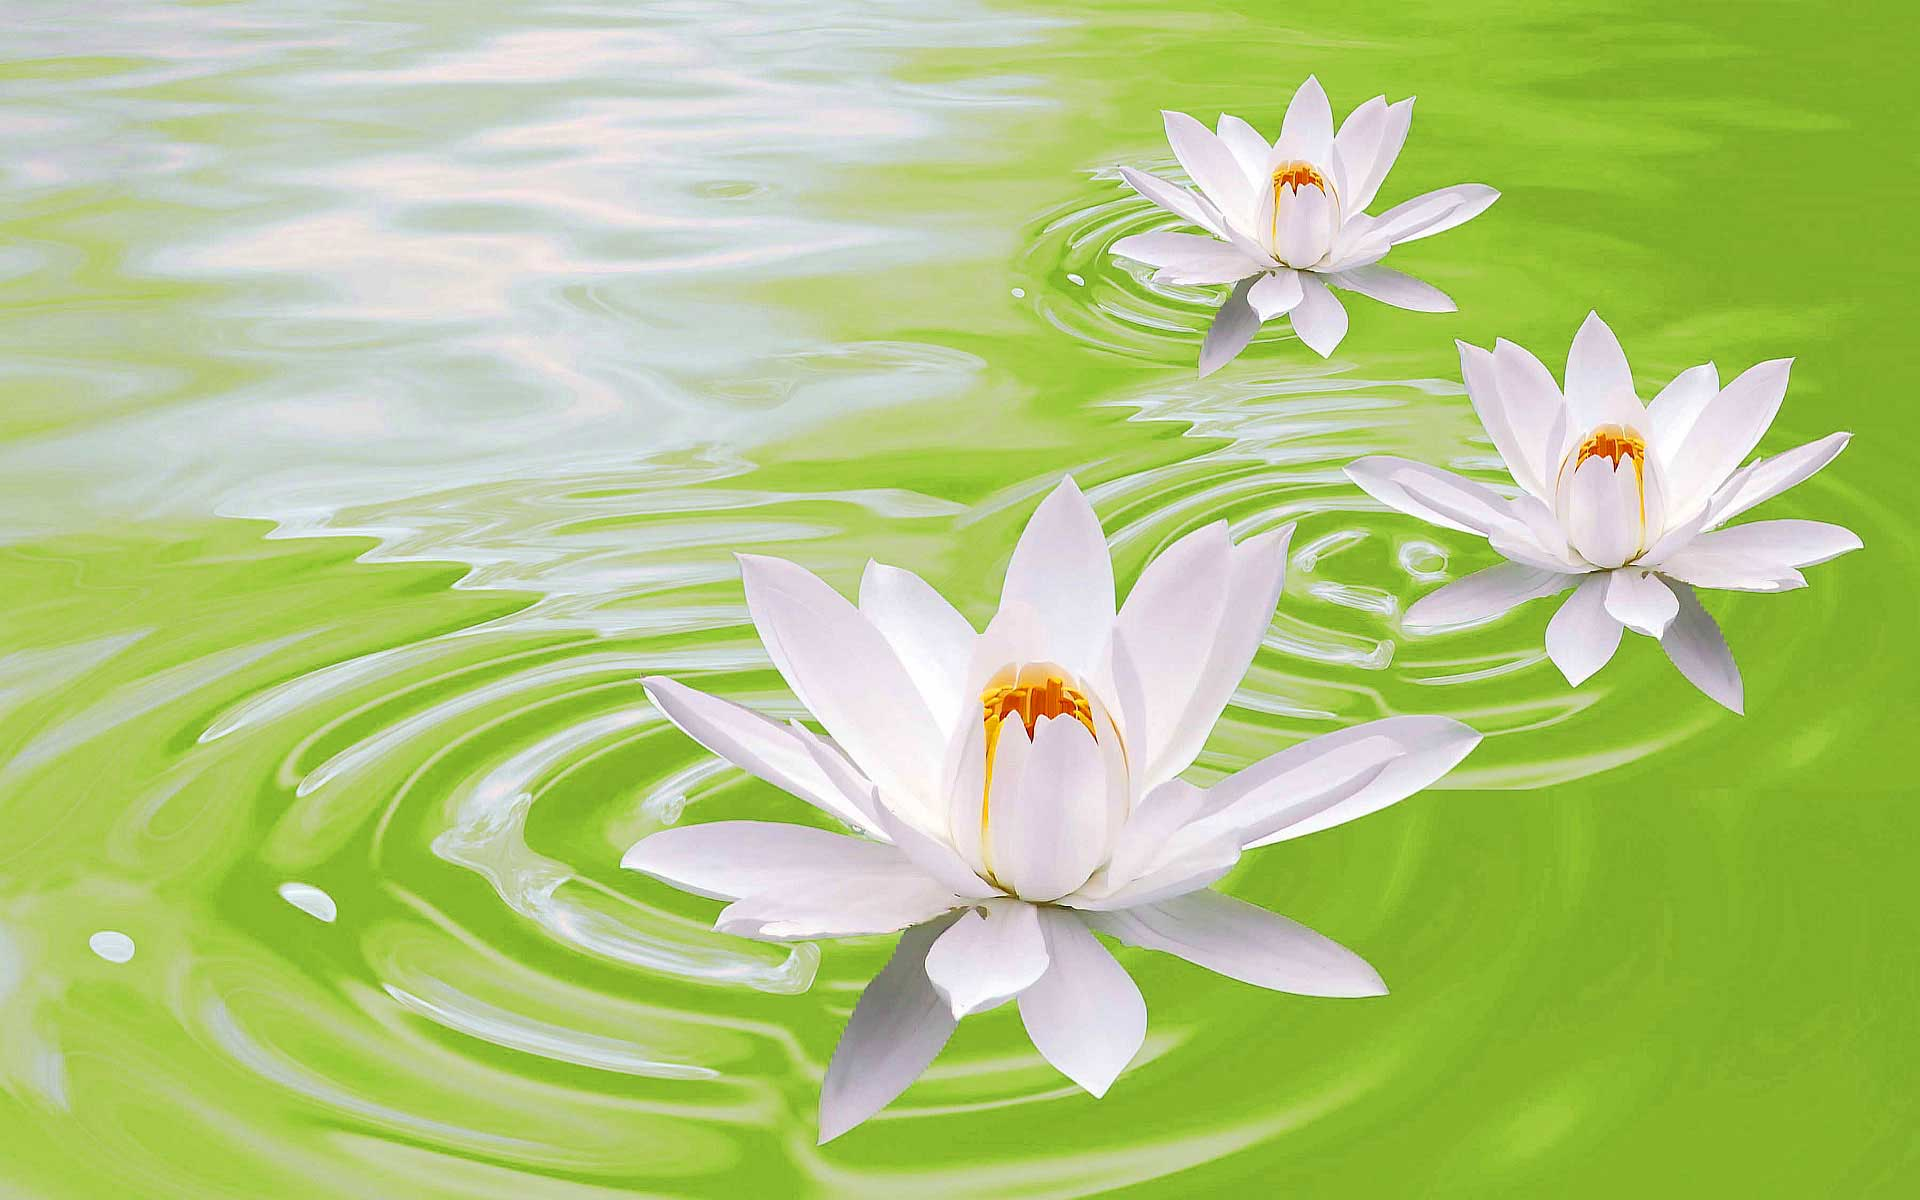 Green lotus flowers 37 widescreen wallpaper hdflowerwallpaper green lotus flowers free wallpaper mightylinksfo